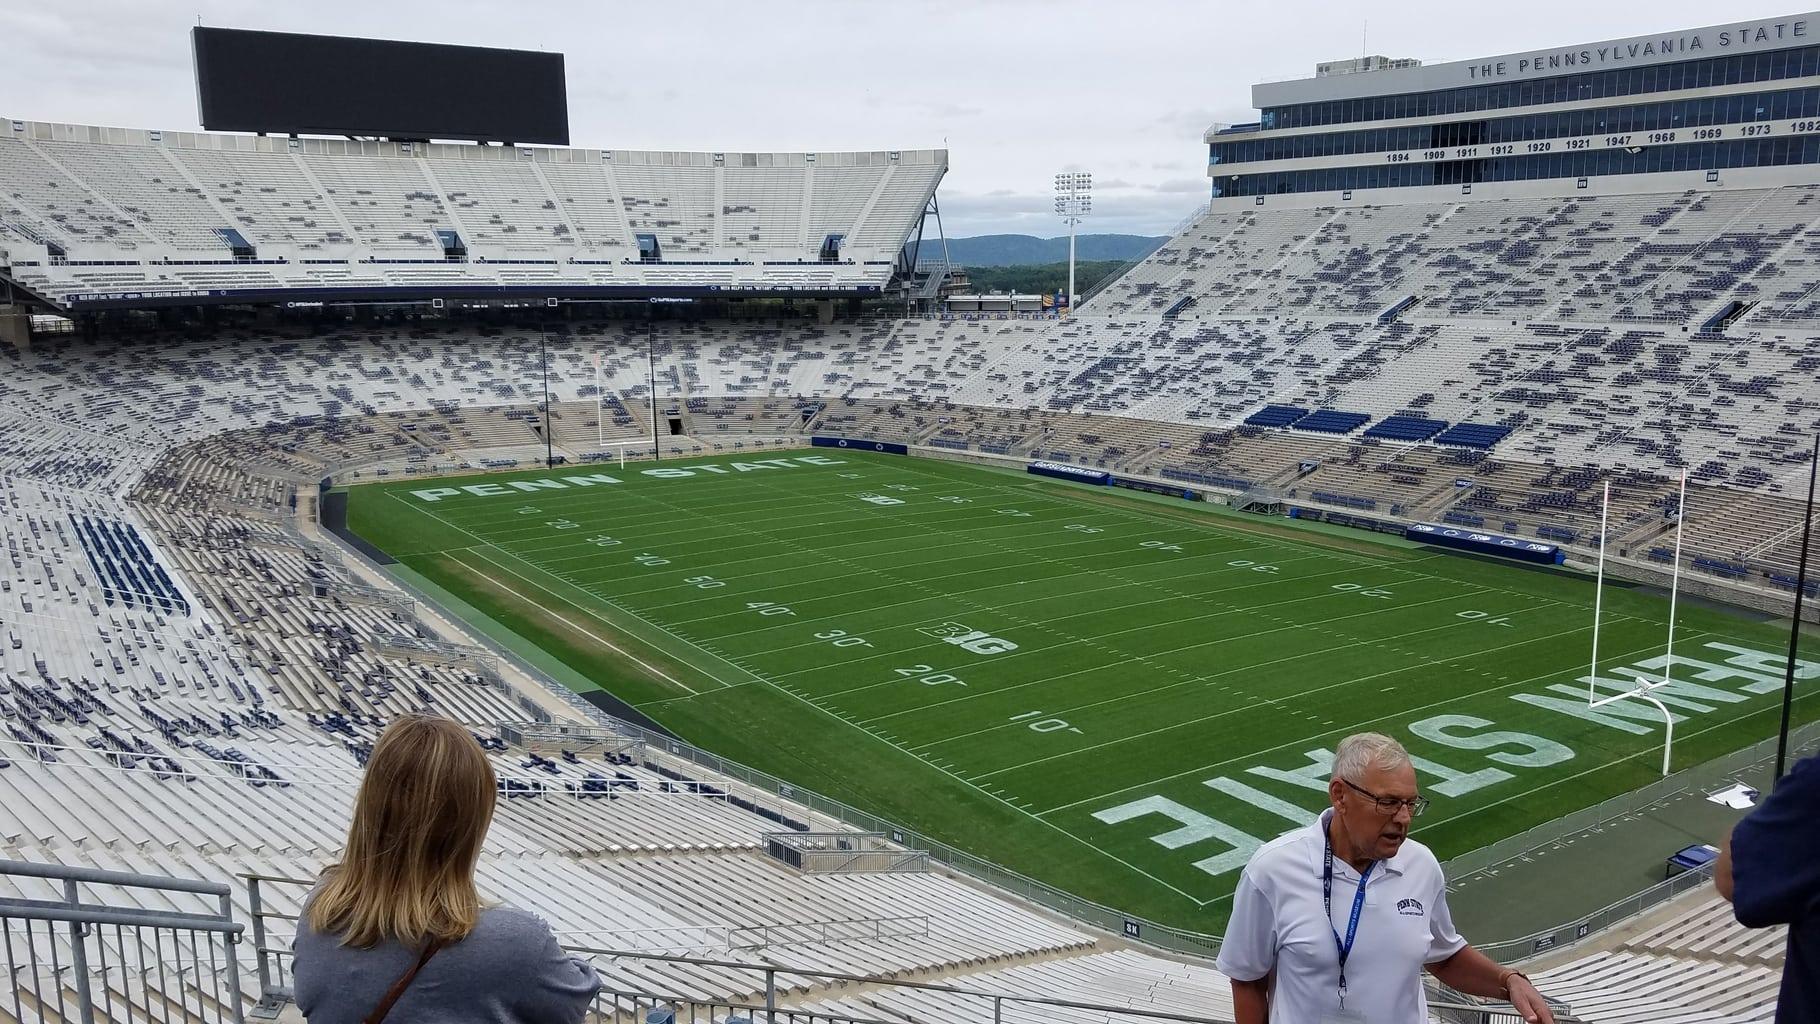 Beaver Stadium Penn State State College PA